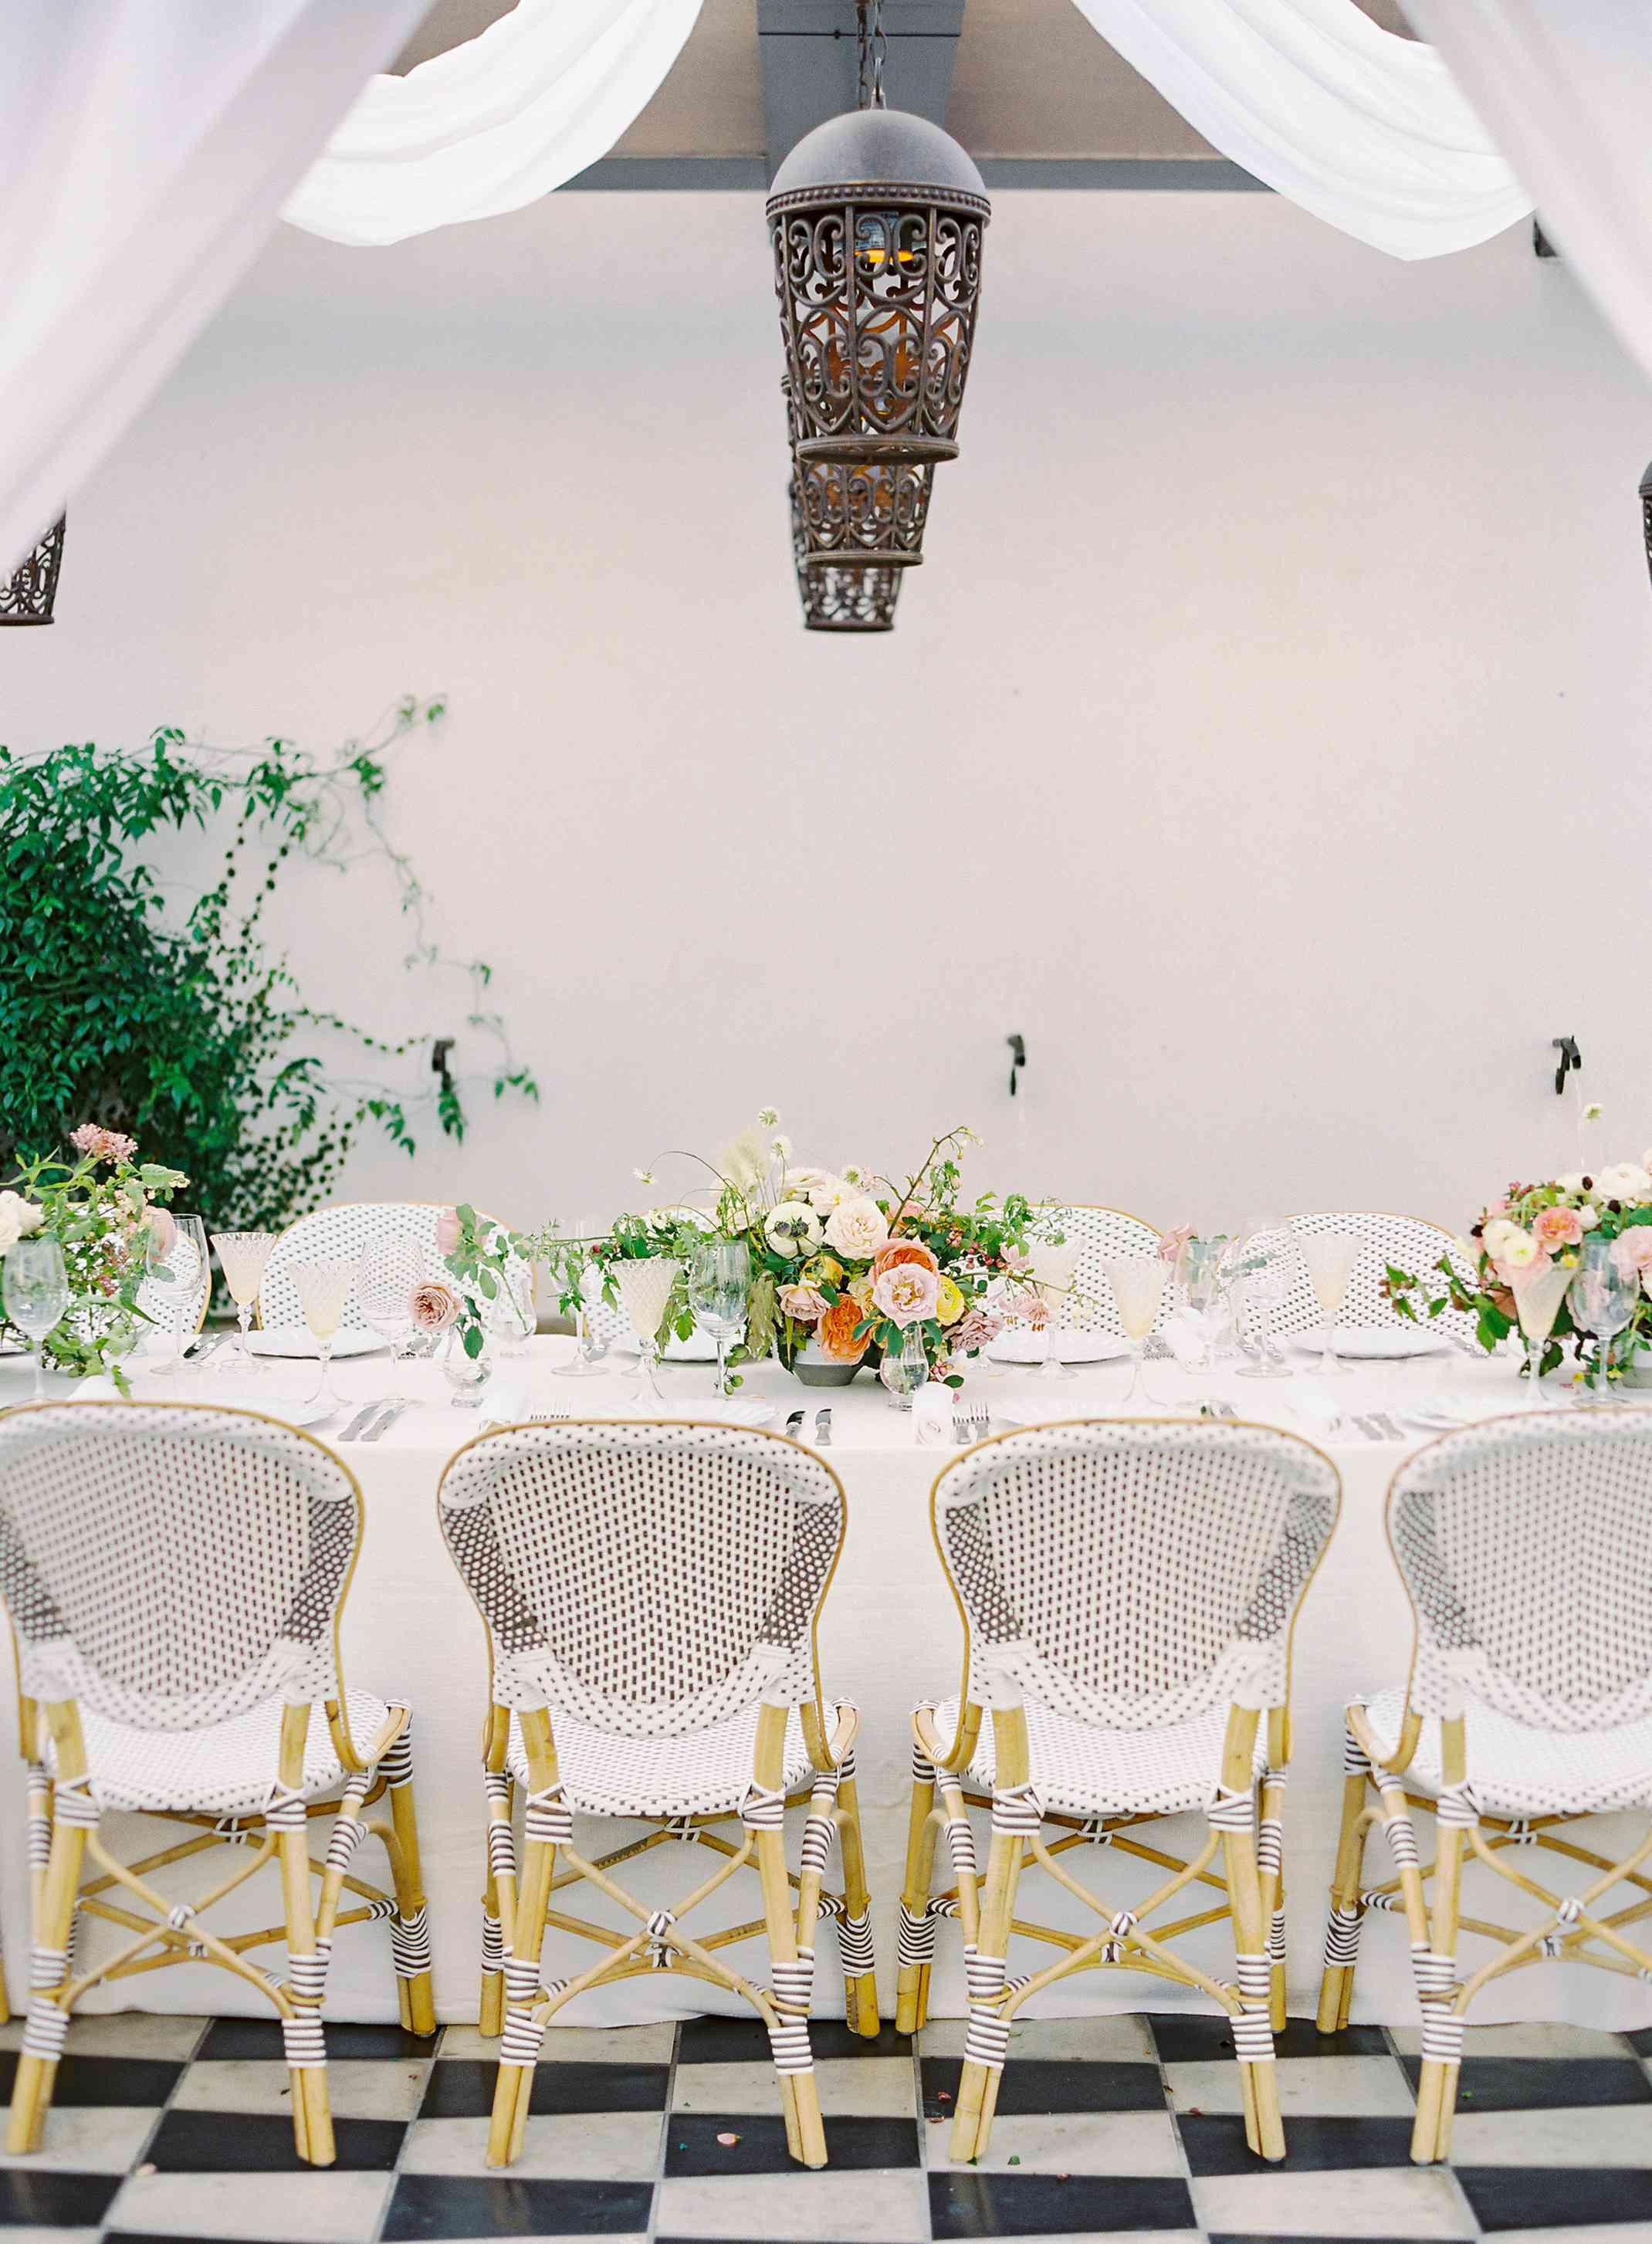 Tablescape at L.A. wedding reception